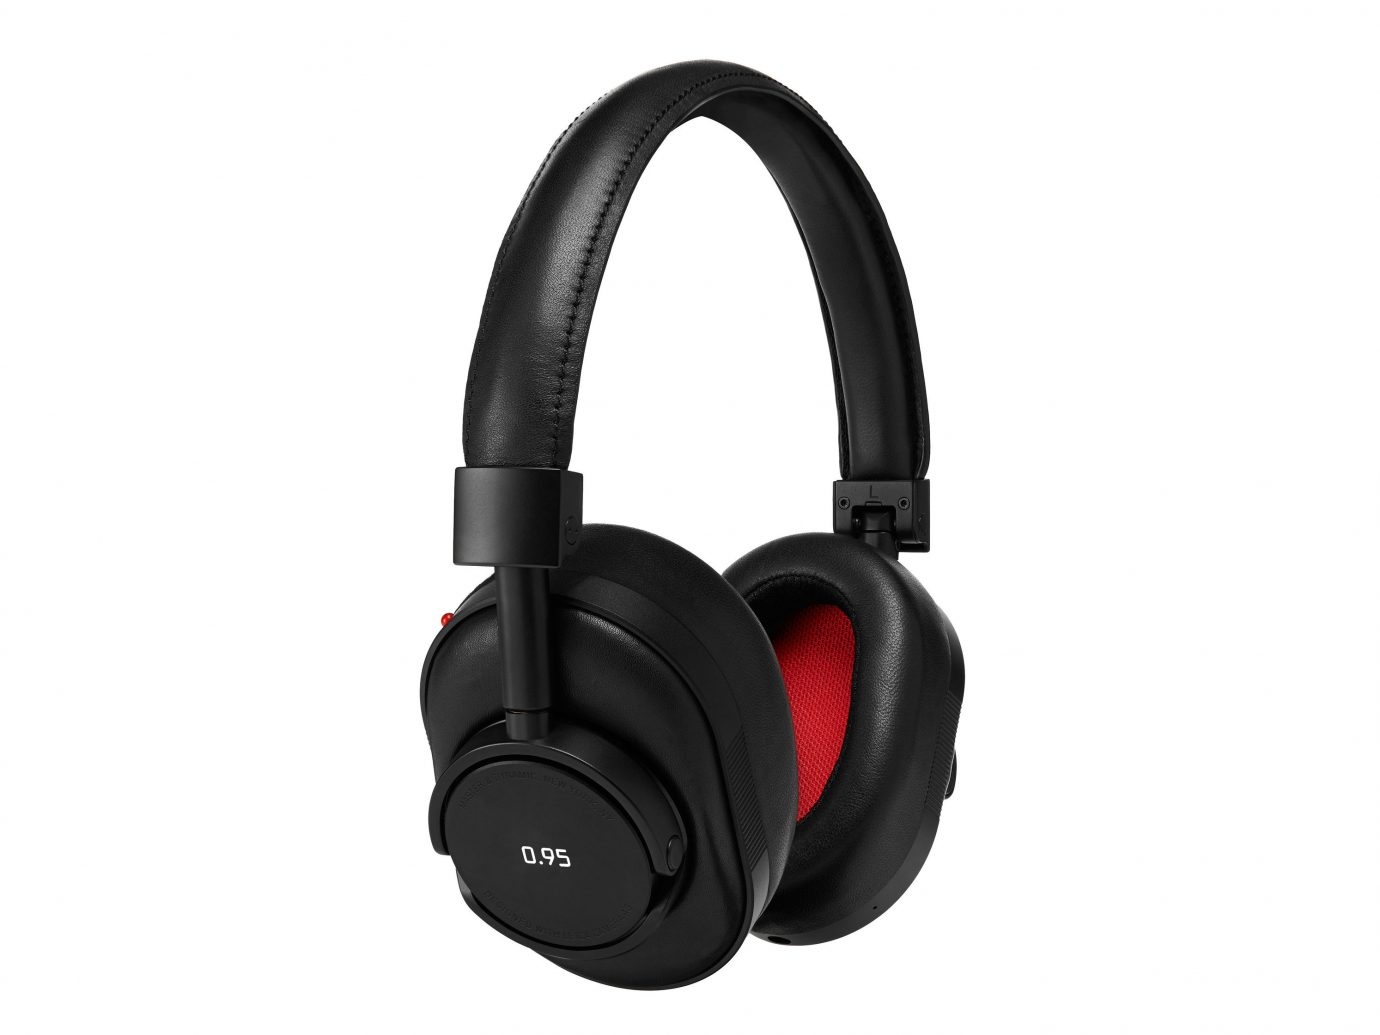 Style + Design electronics earphone headset gadget headphones technology electronic device audio equipment communication device product ear audio